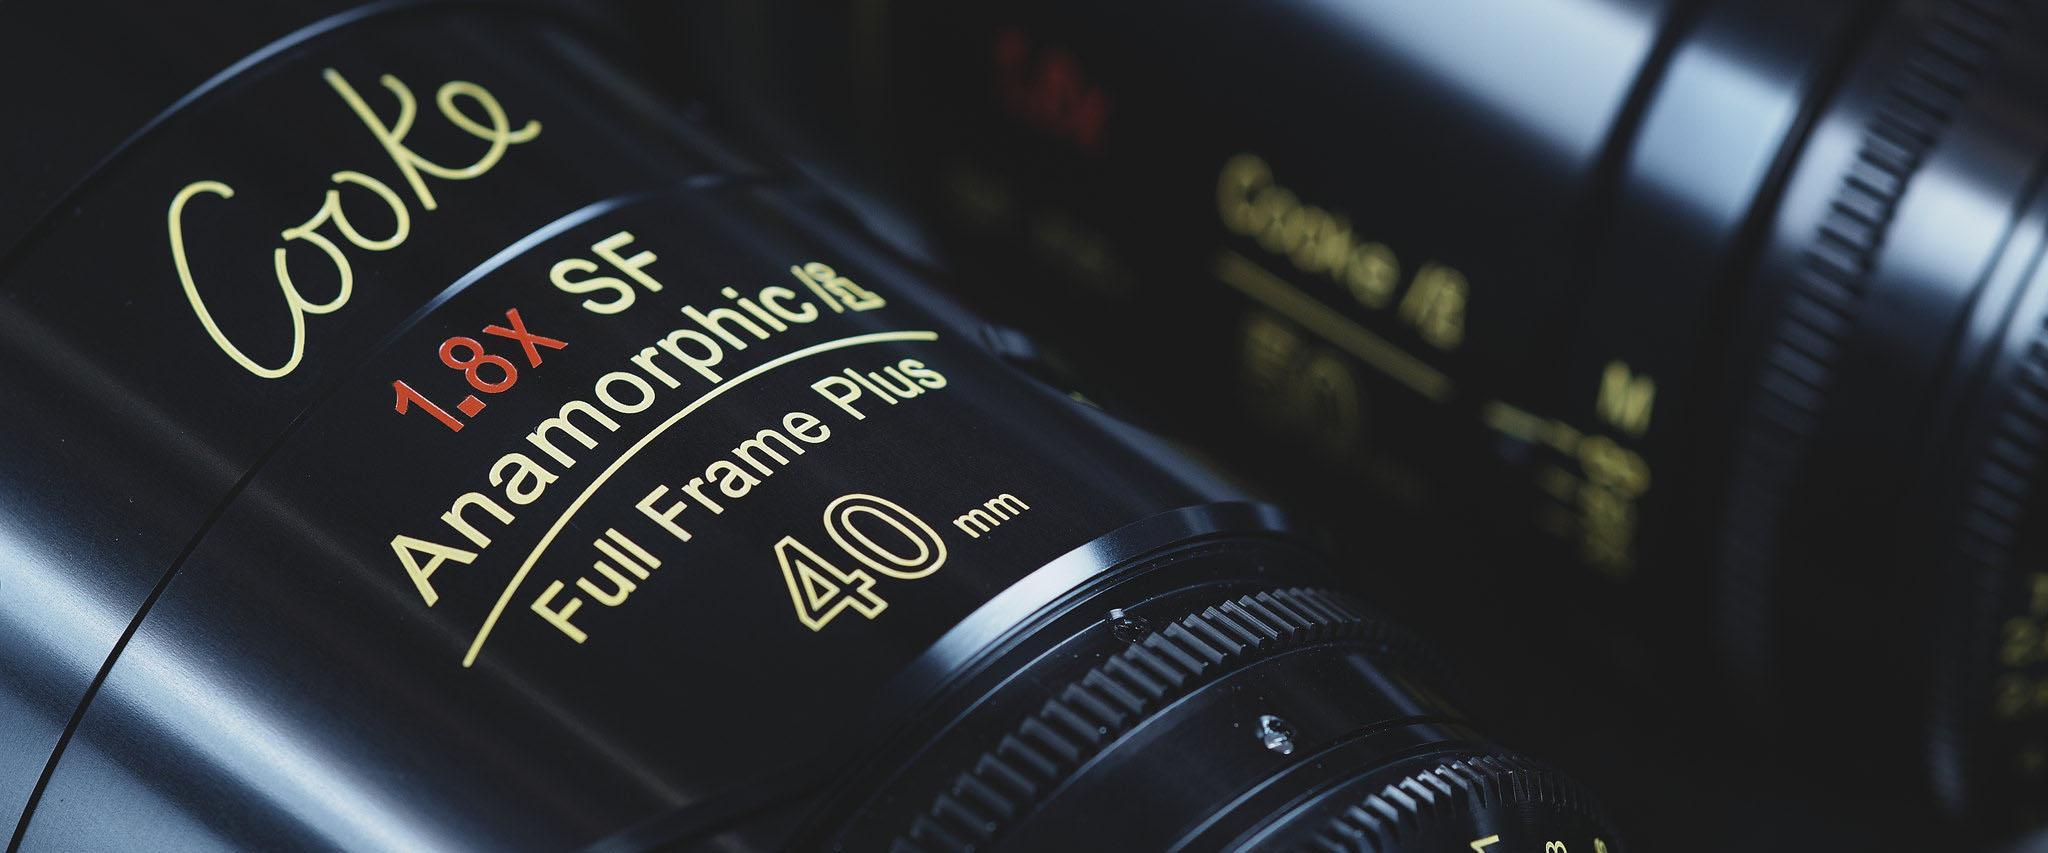 https://valofirma.fi/en/product-category/camera-en/lenses-pl-full-frame-anamorphic-camera-en/